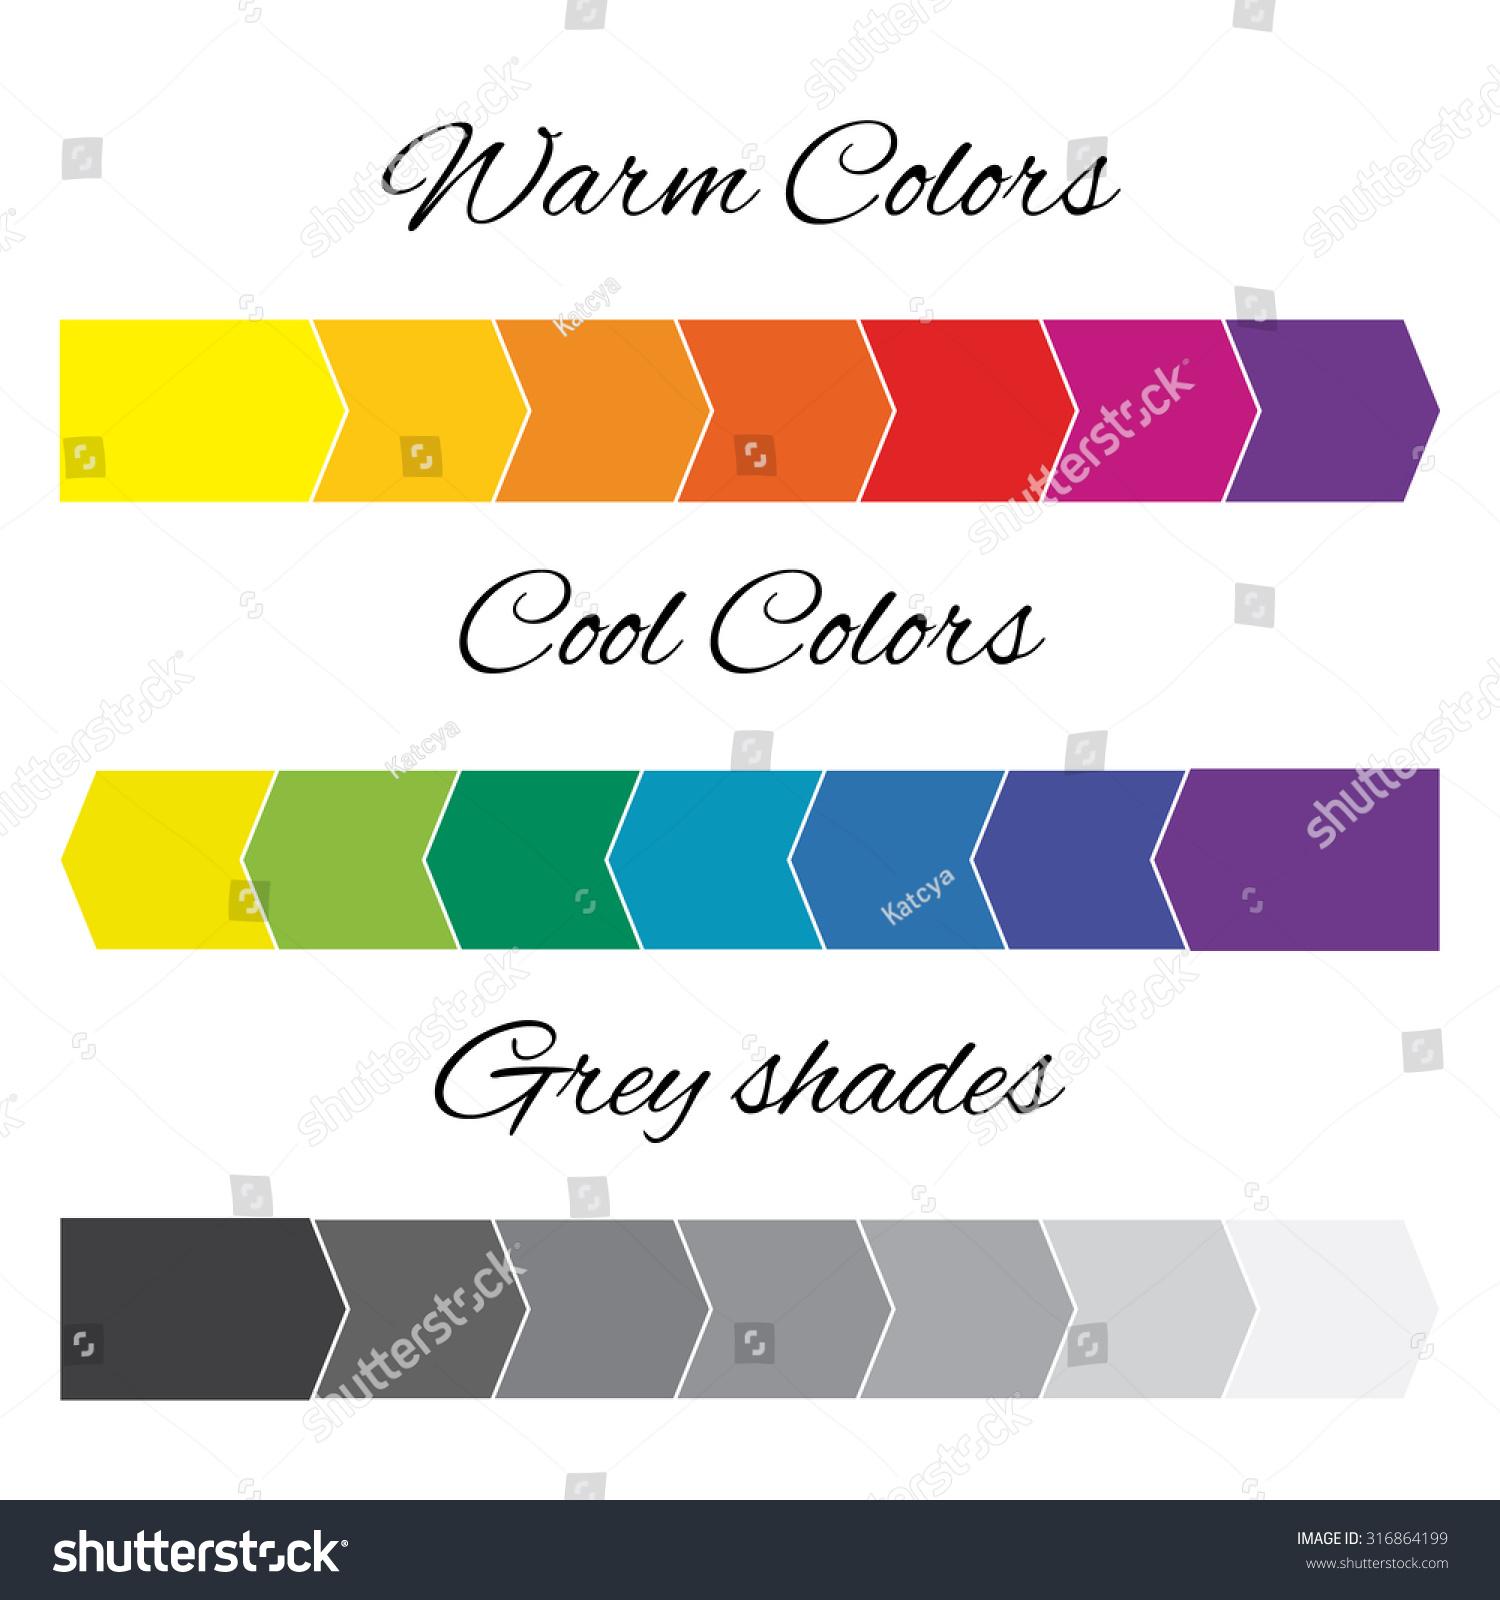 warm colors cool colors shades grey のベクター画像素材